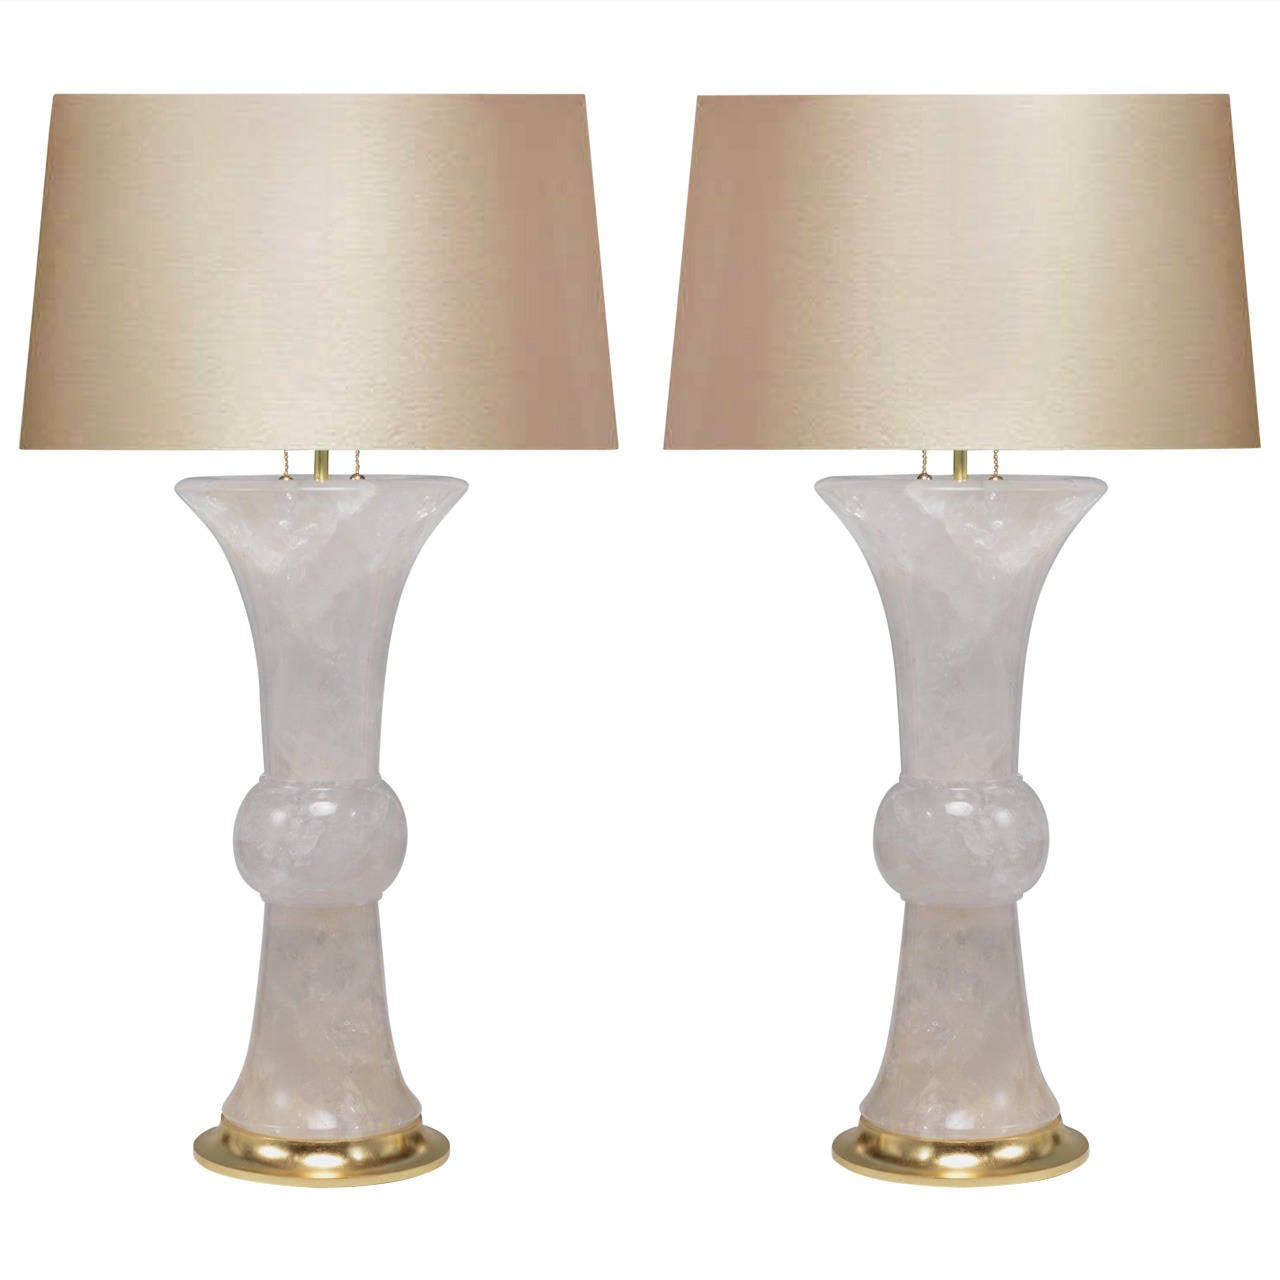 Pair of Beaker Vases Form Rock Crystal Quartz Lamps